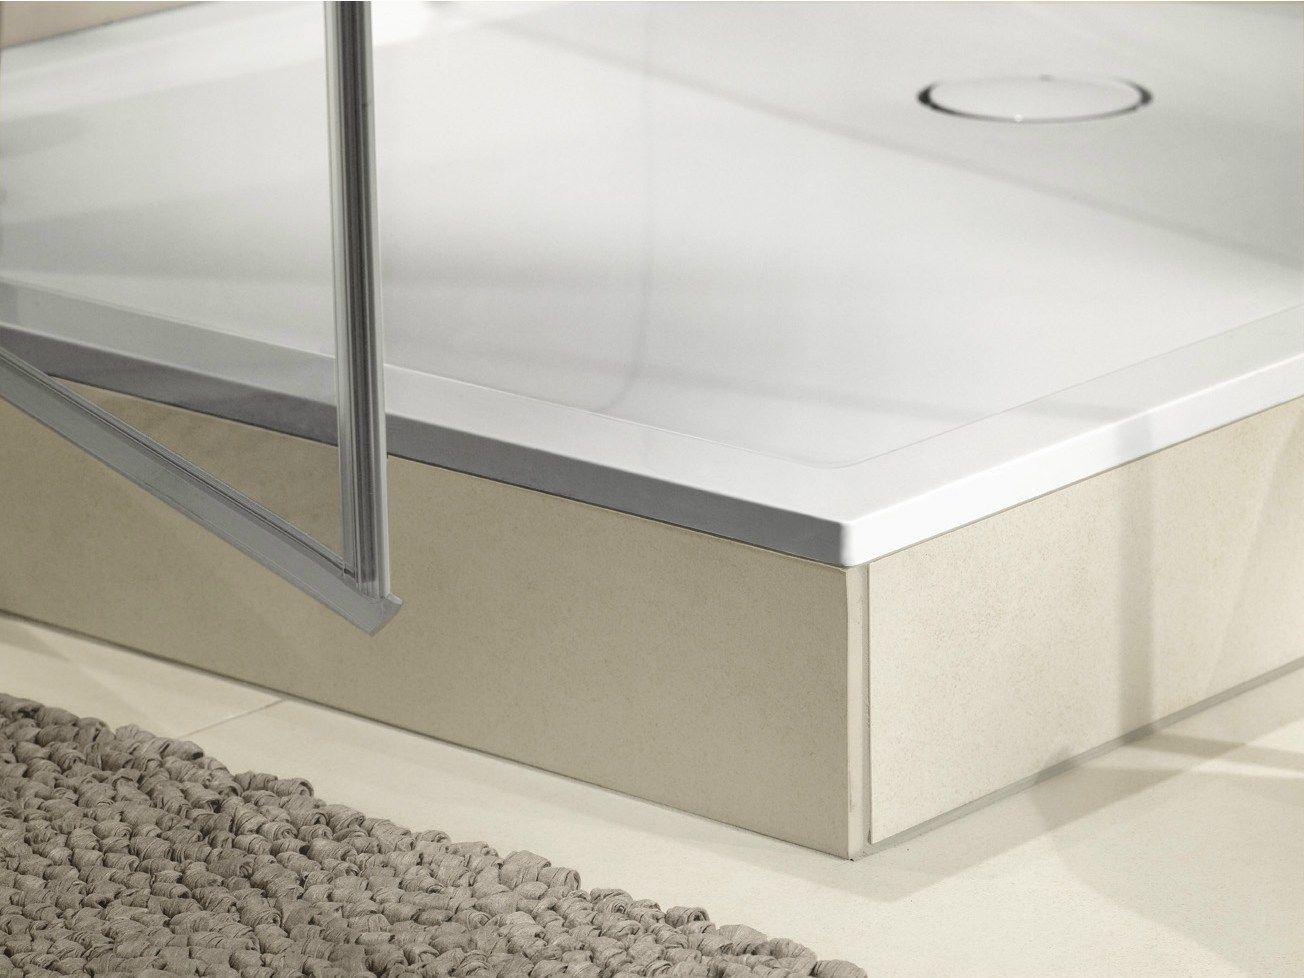 Futurion flat receveur de douche by villeroy boch - Installer un bac a douche ...